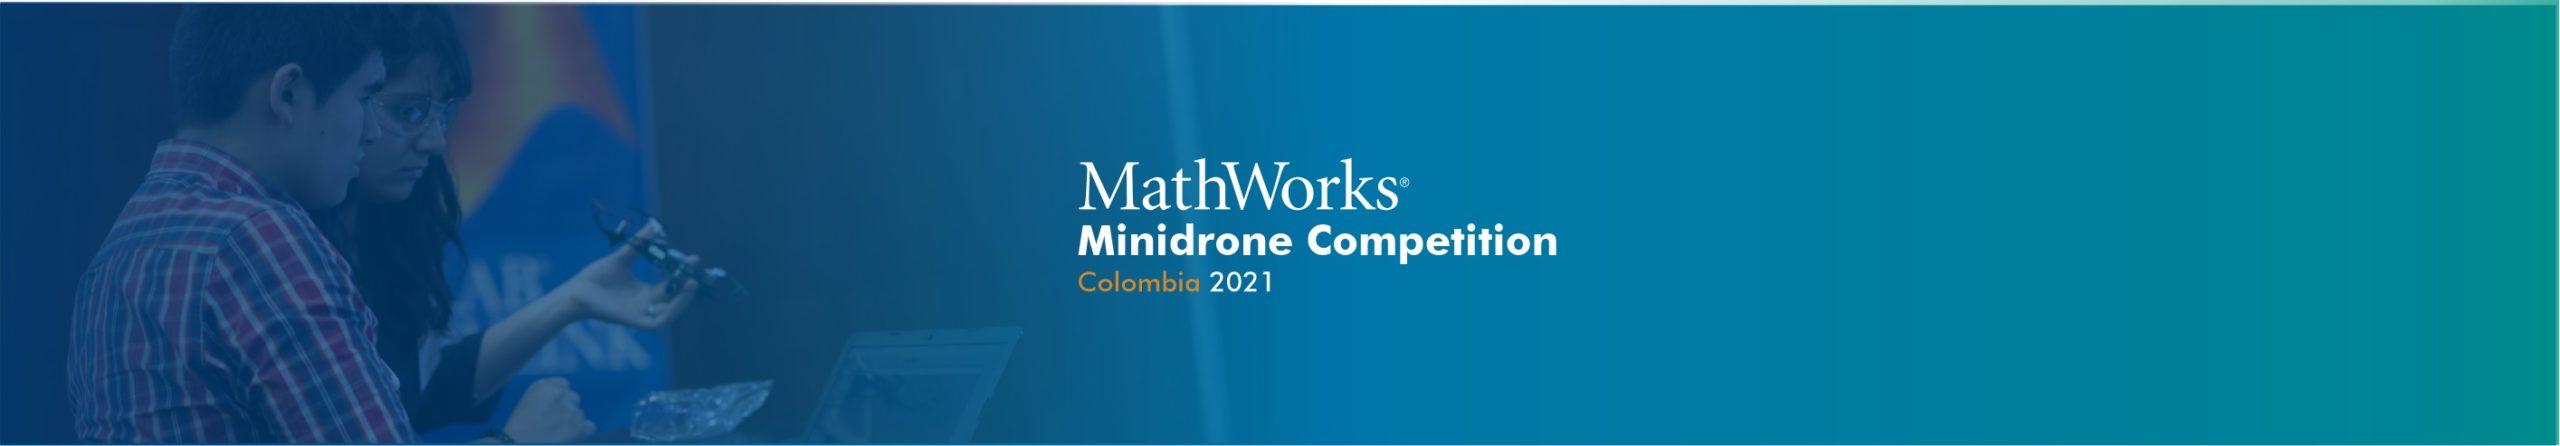 MathWorks Minidrone Competition